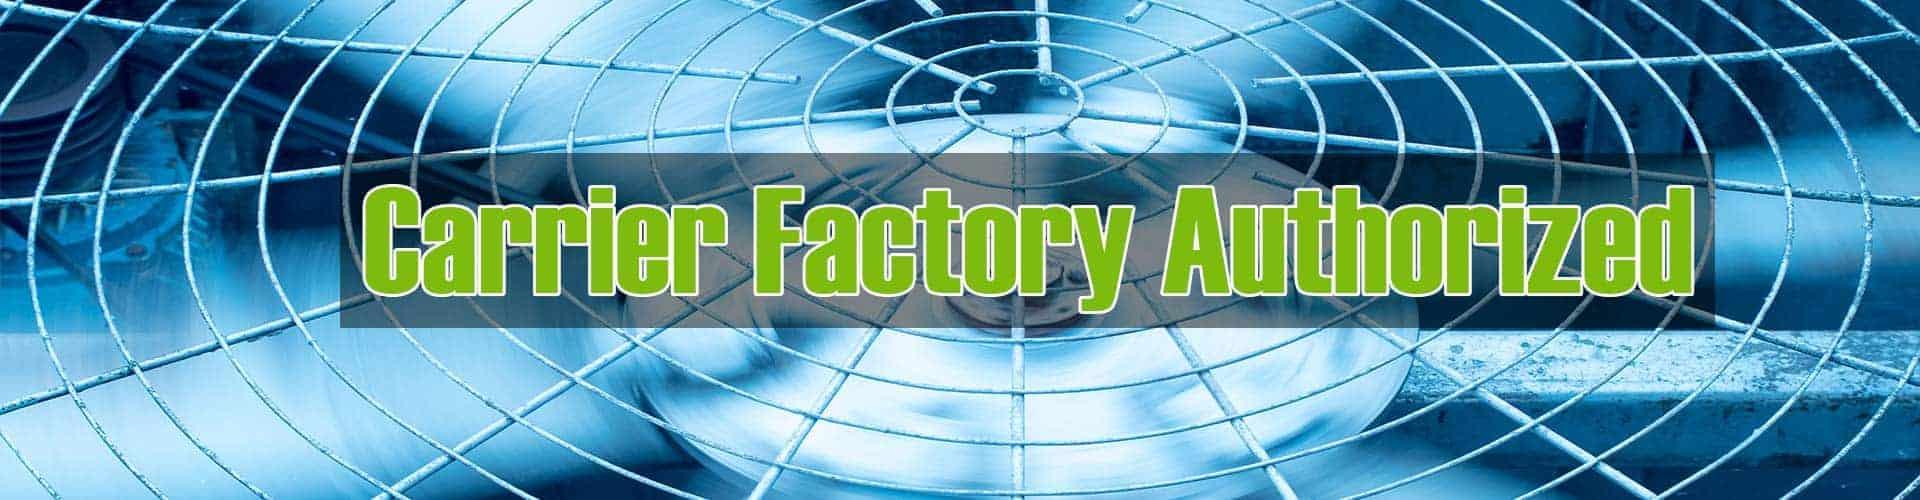 Carrier Factory Authorized Elgin Illinois Dealer